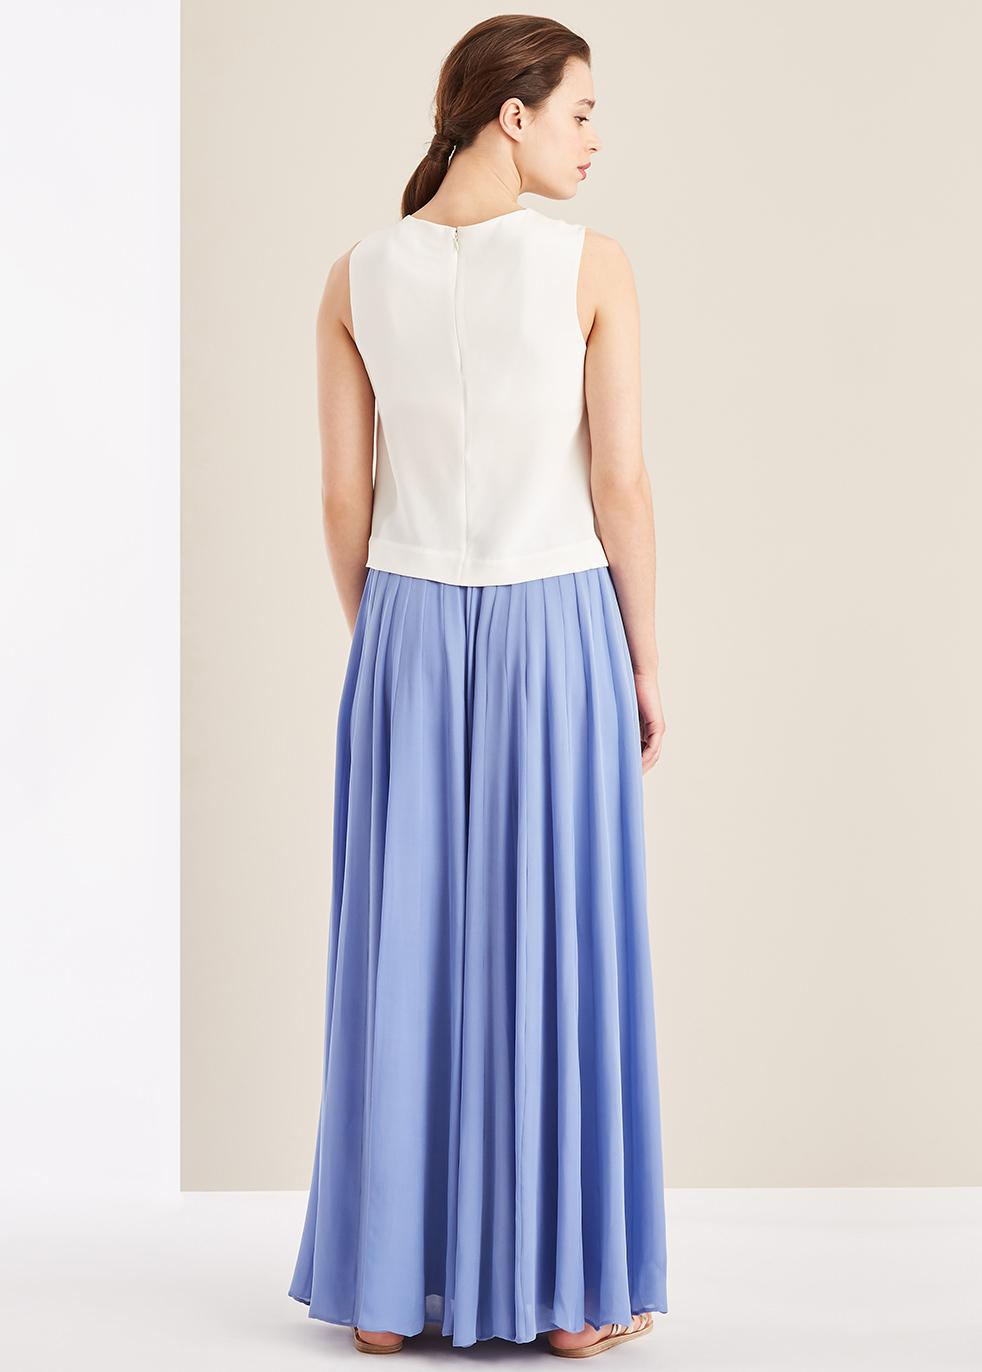 White silk sleeveless top - Varana